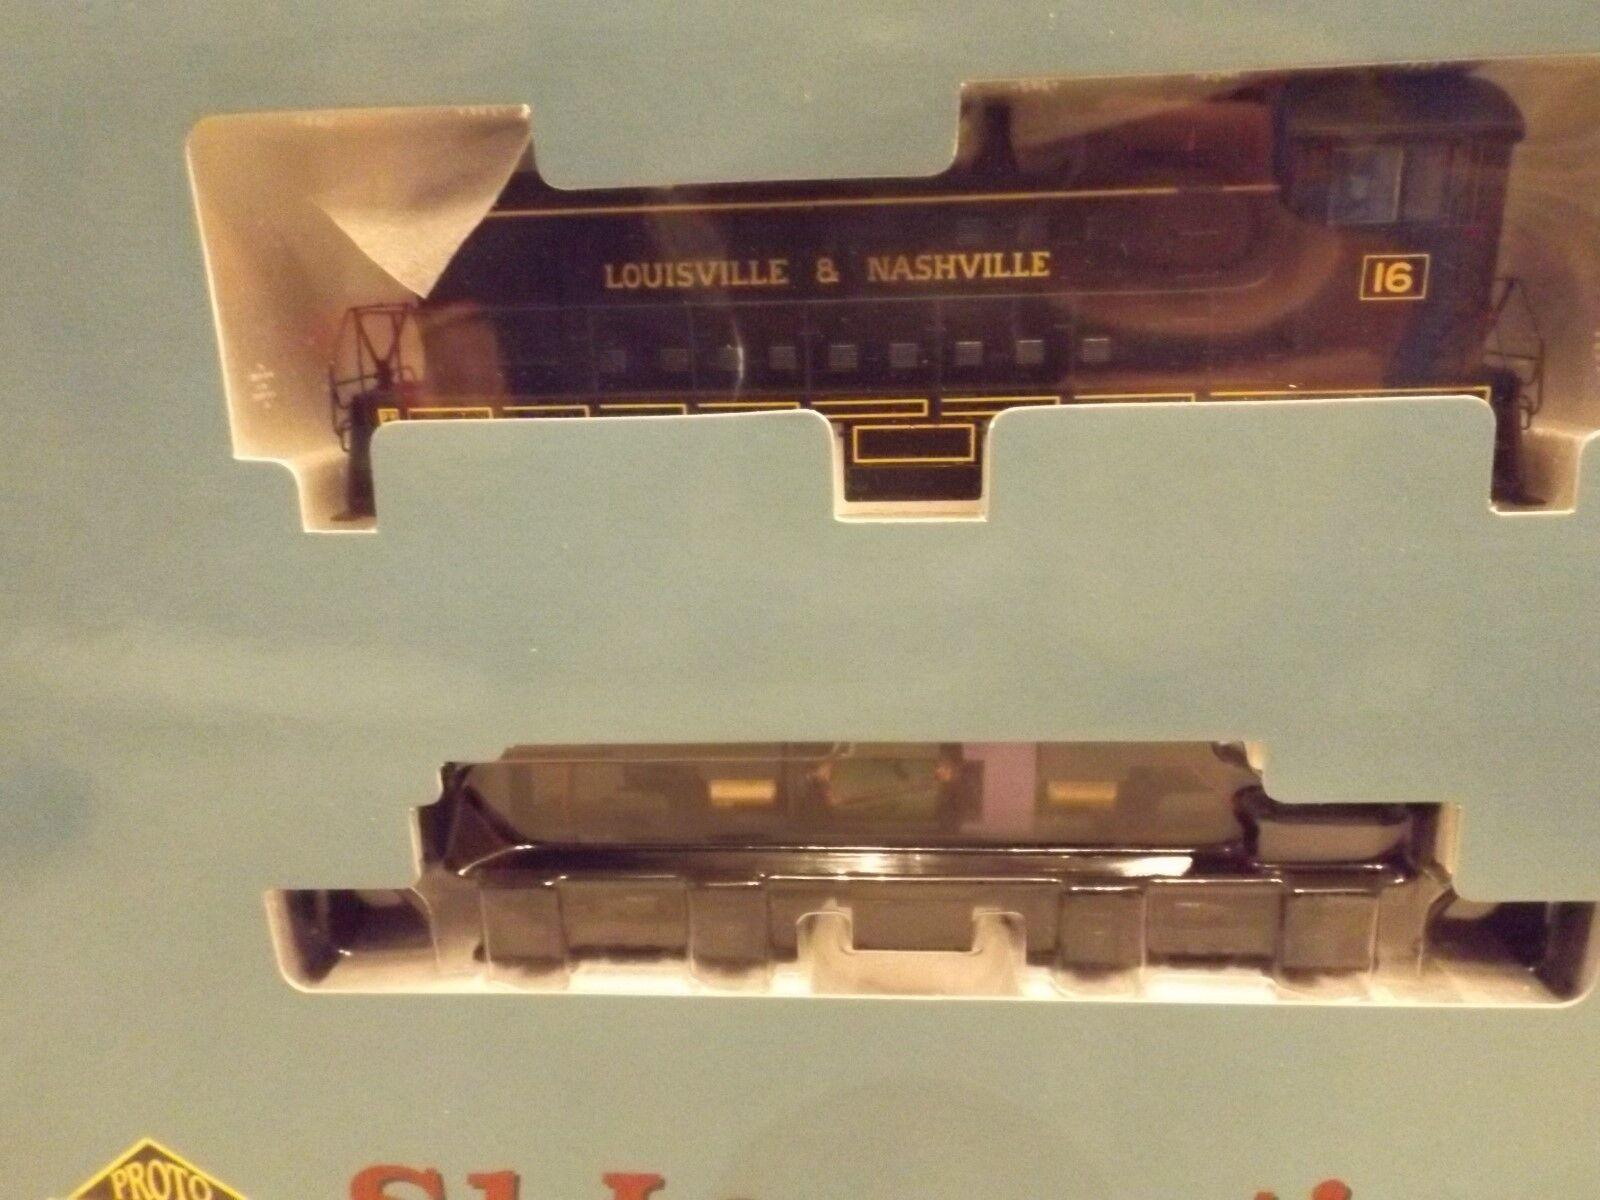 HO Predo 2000 L&N S1 diesel engine in original box